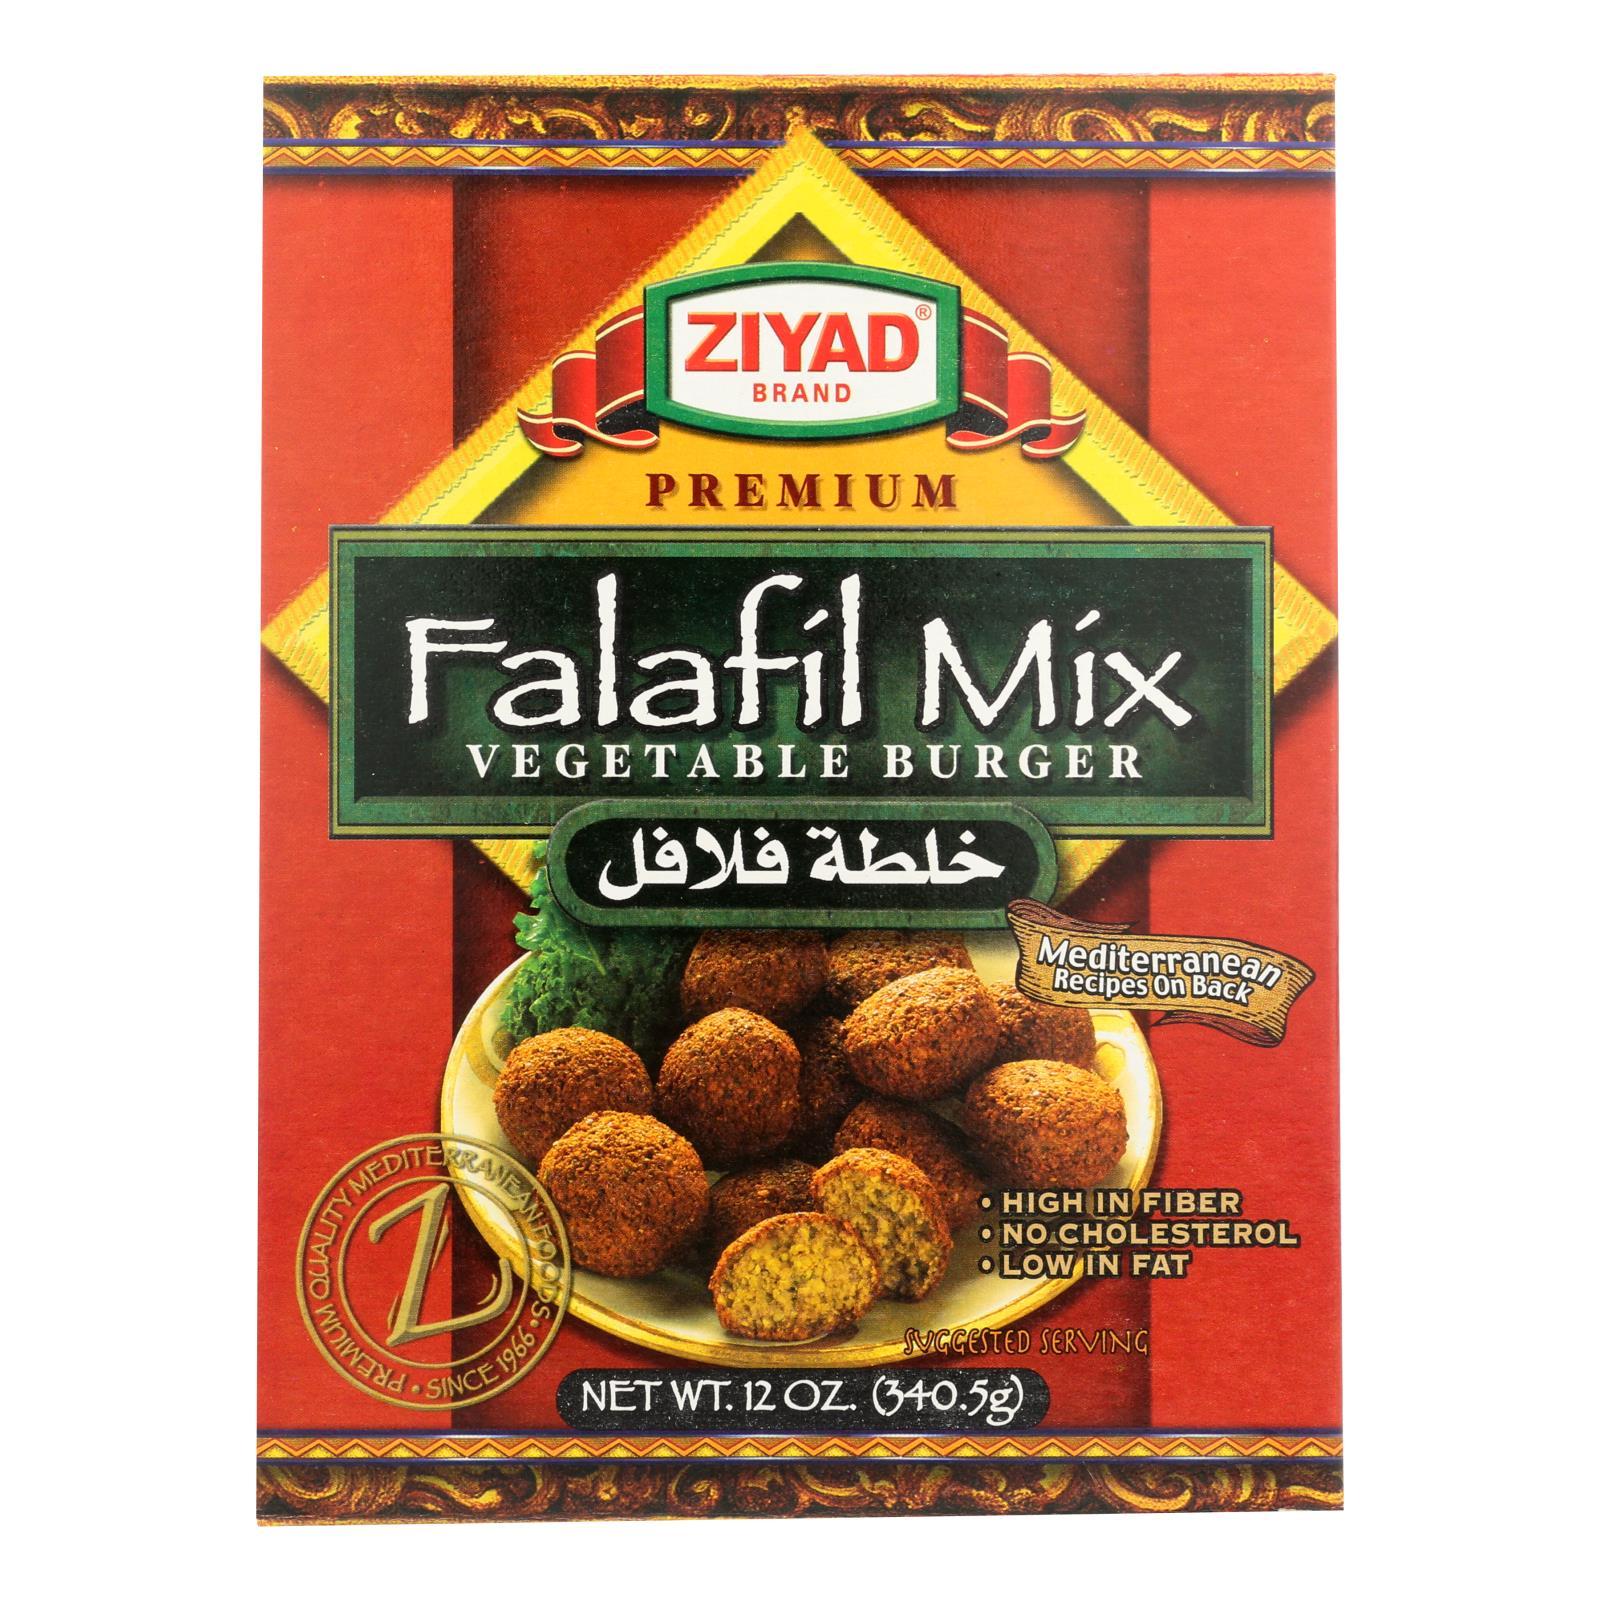 Ziyad Brand Falafil Mix - Vegetable Burger - Case of 6 - 12 OZ